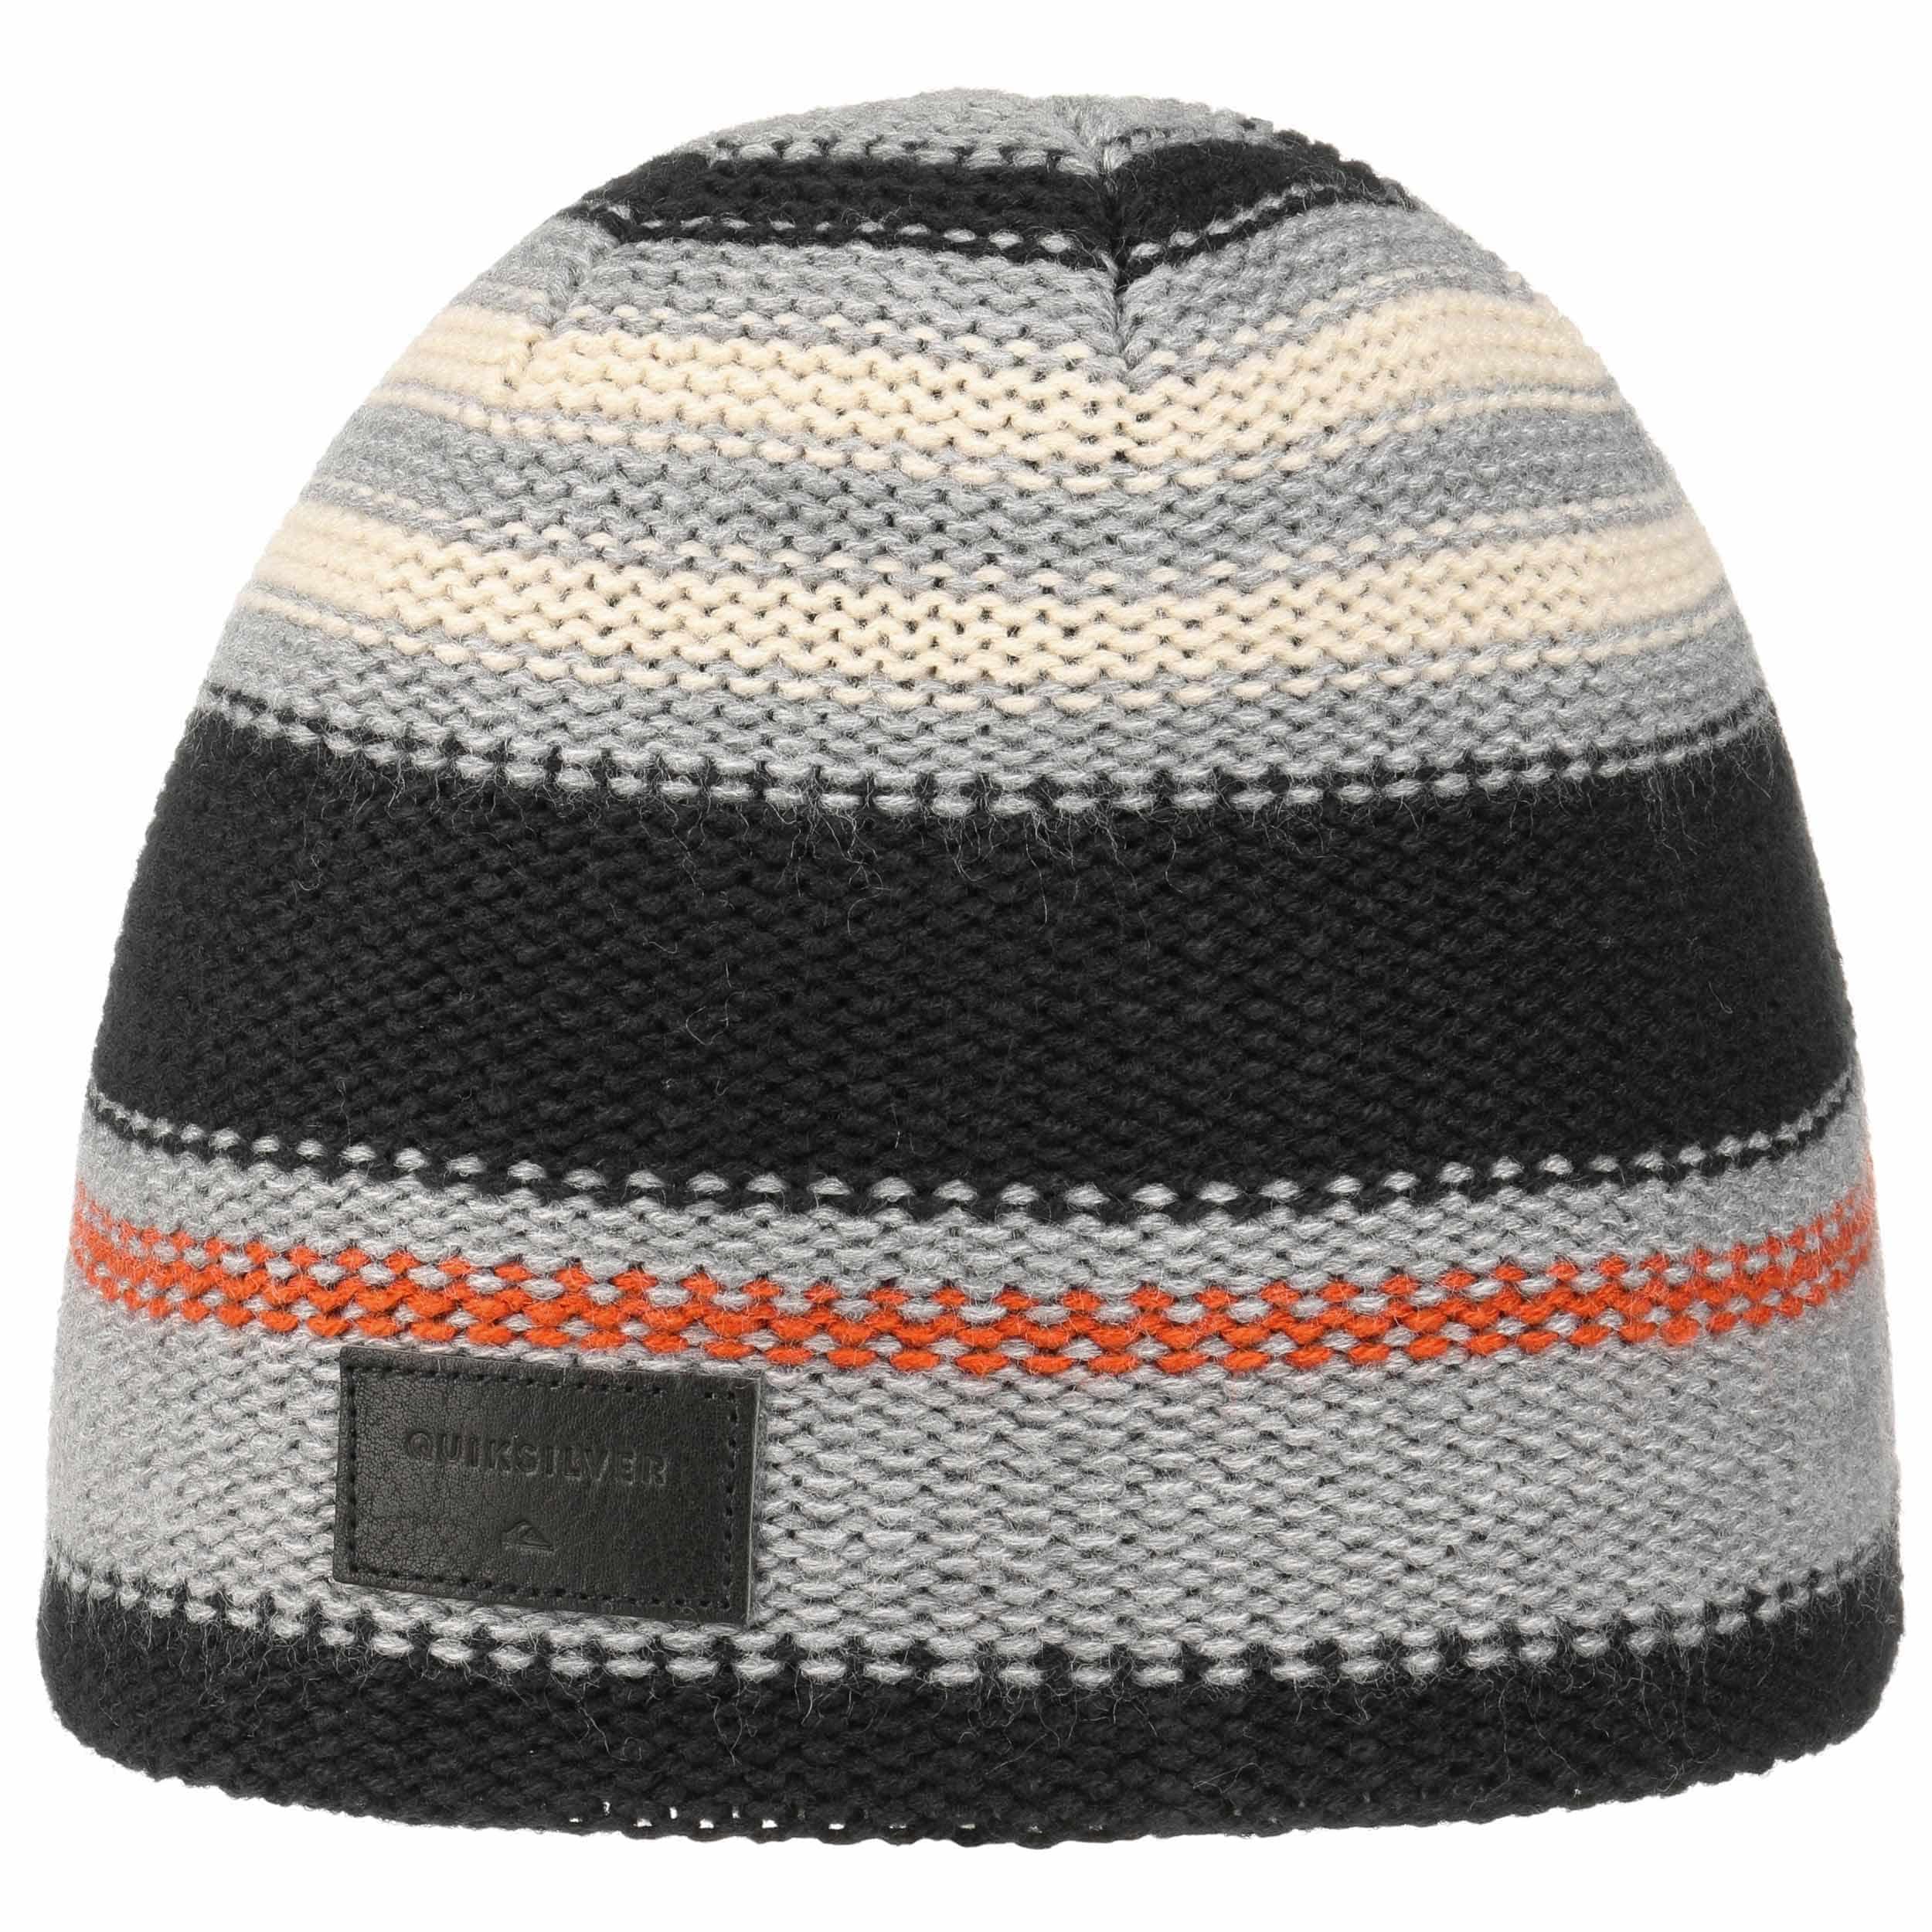 a3bcc6b745a ... Jacquard Stripe Beanie by Quiksilver - black 4